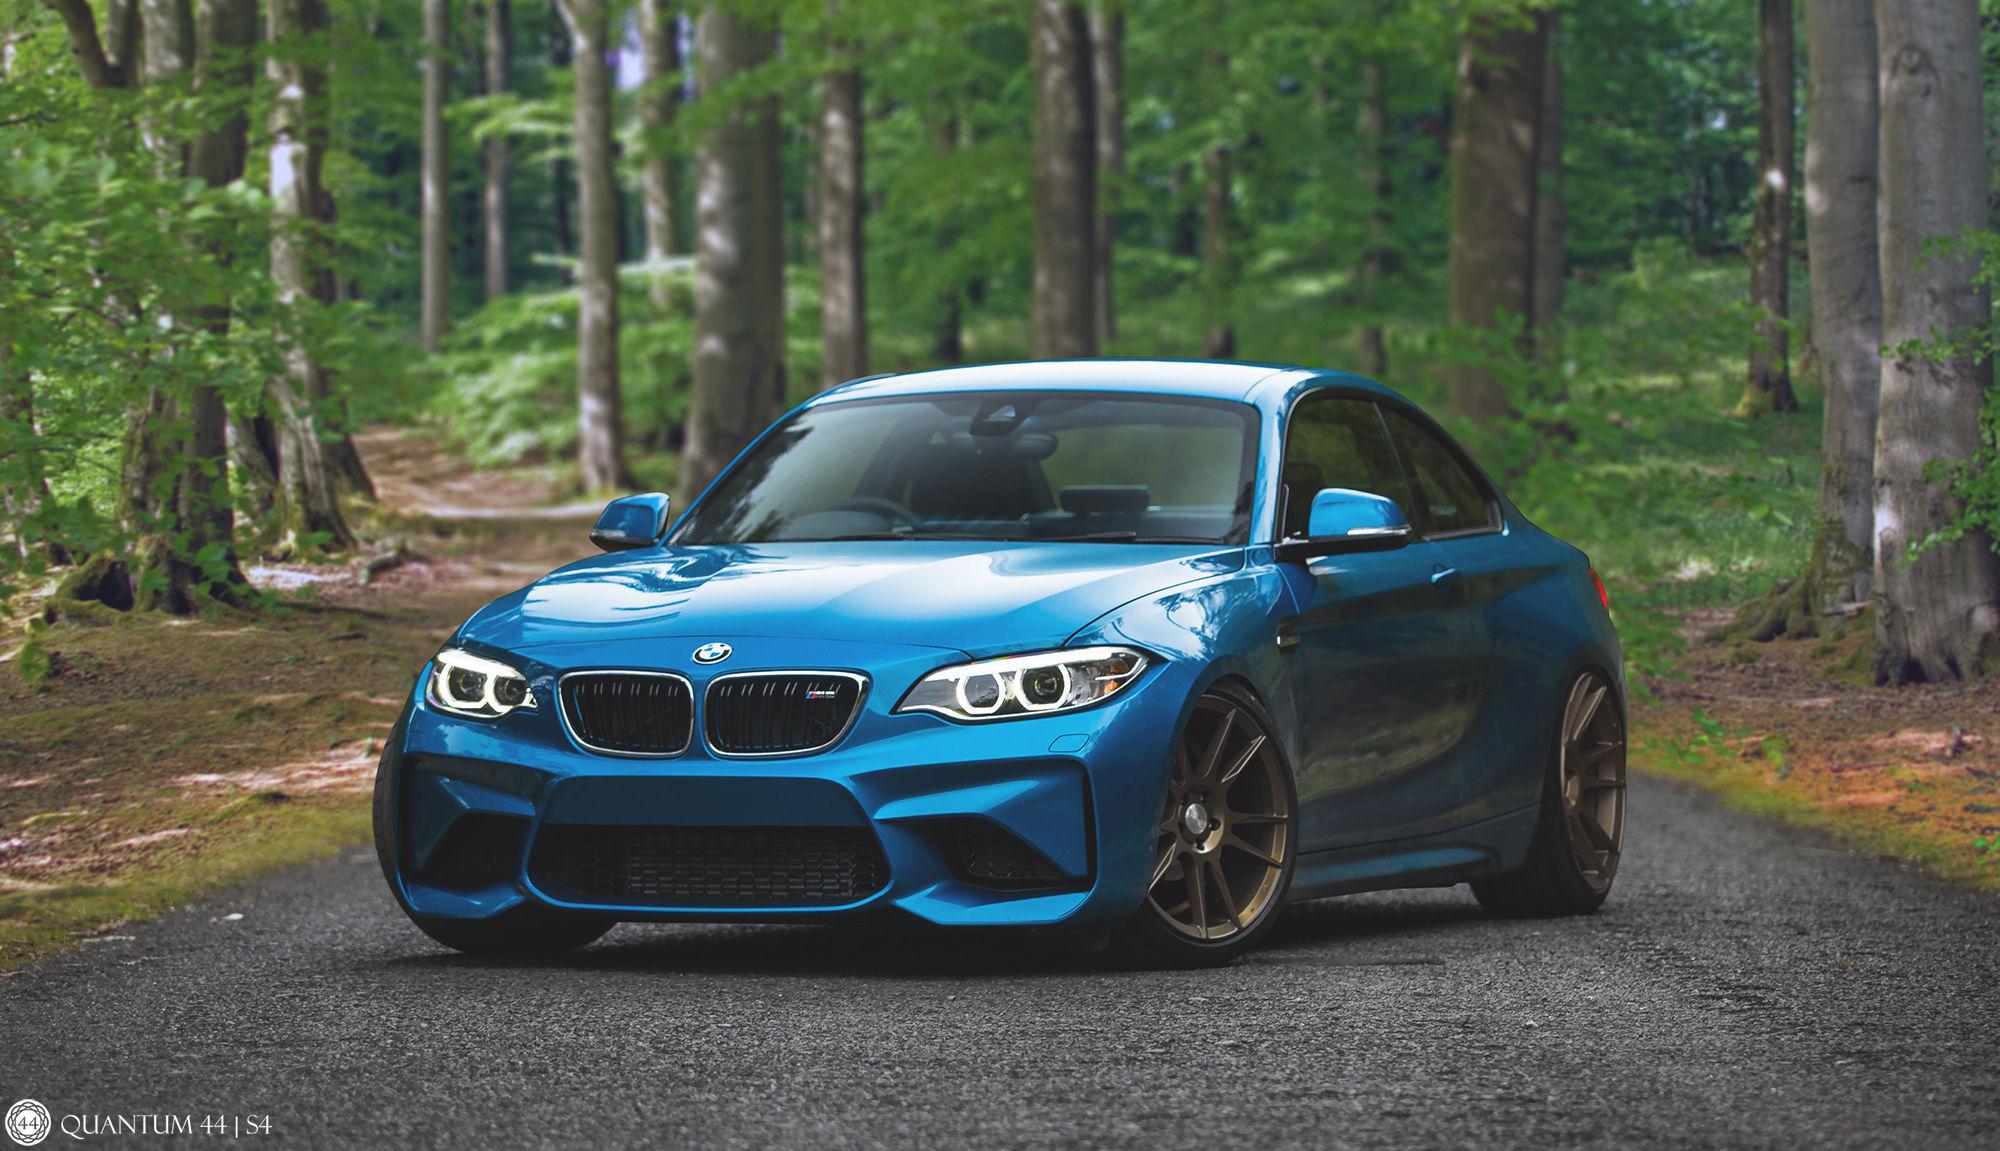 BMW M2 | Quantum44 S4 - BMW M2 Coupe